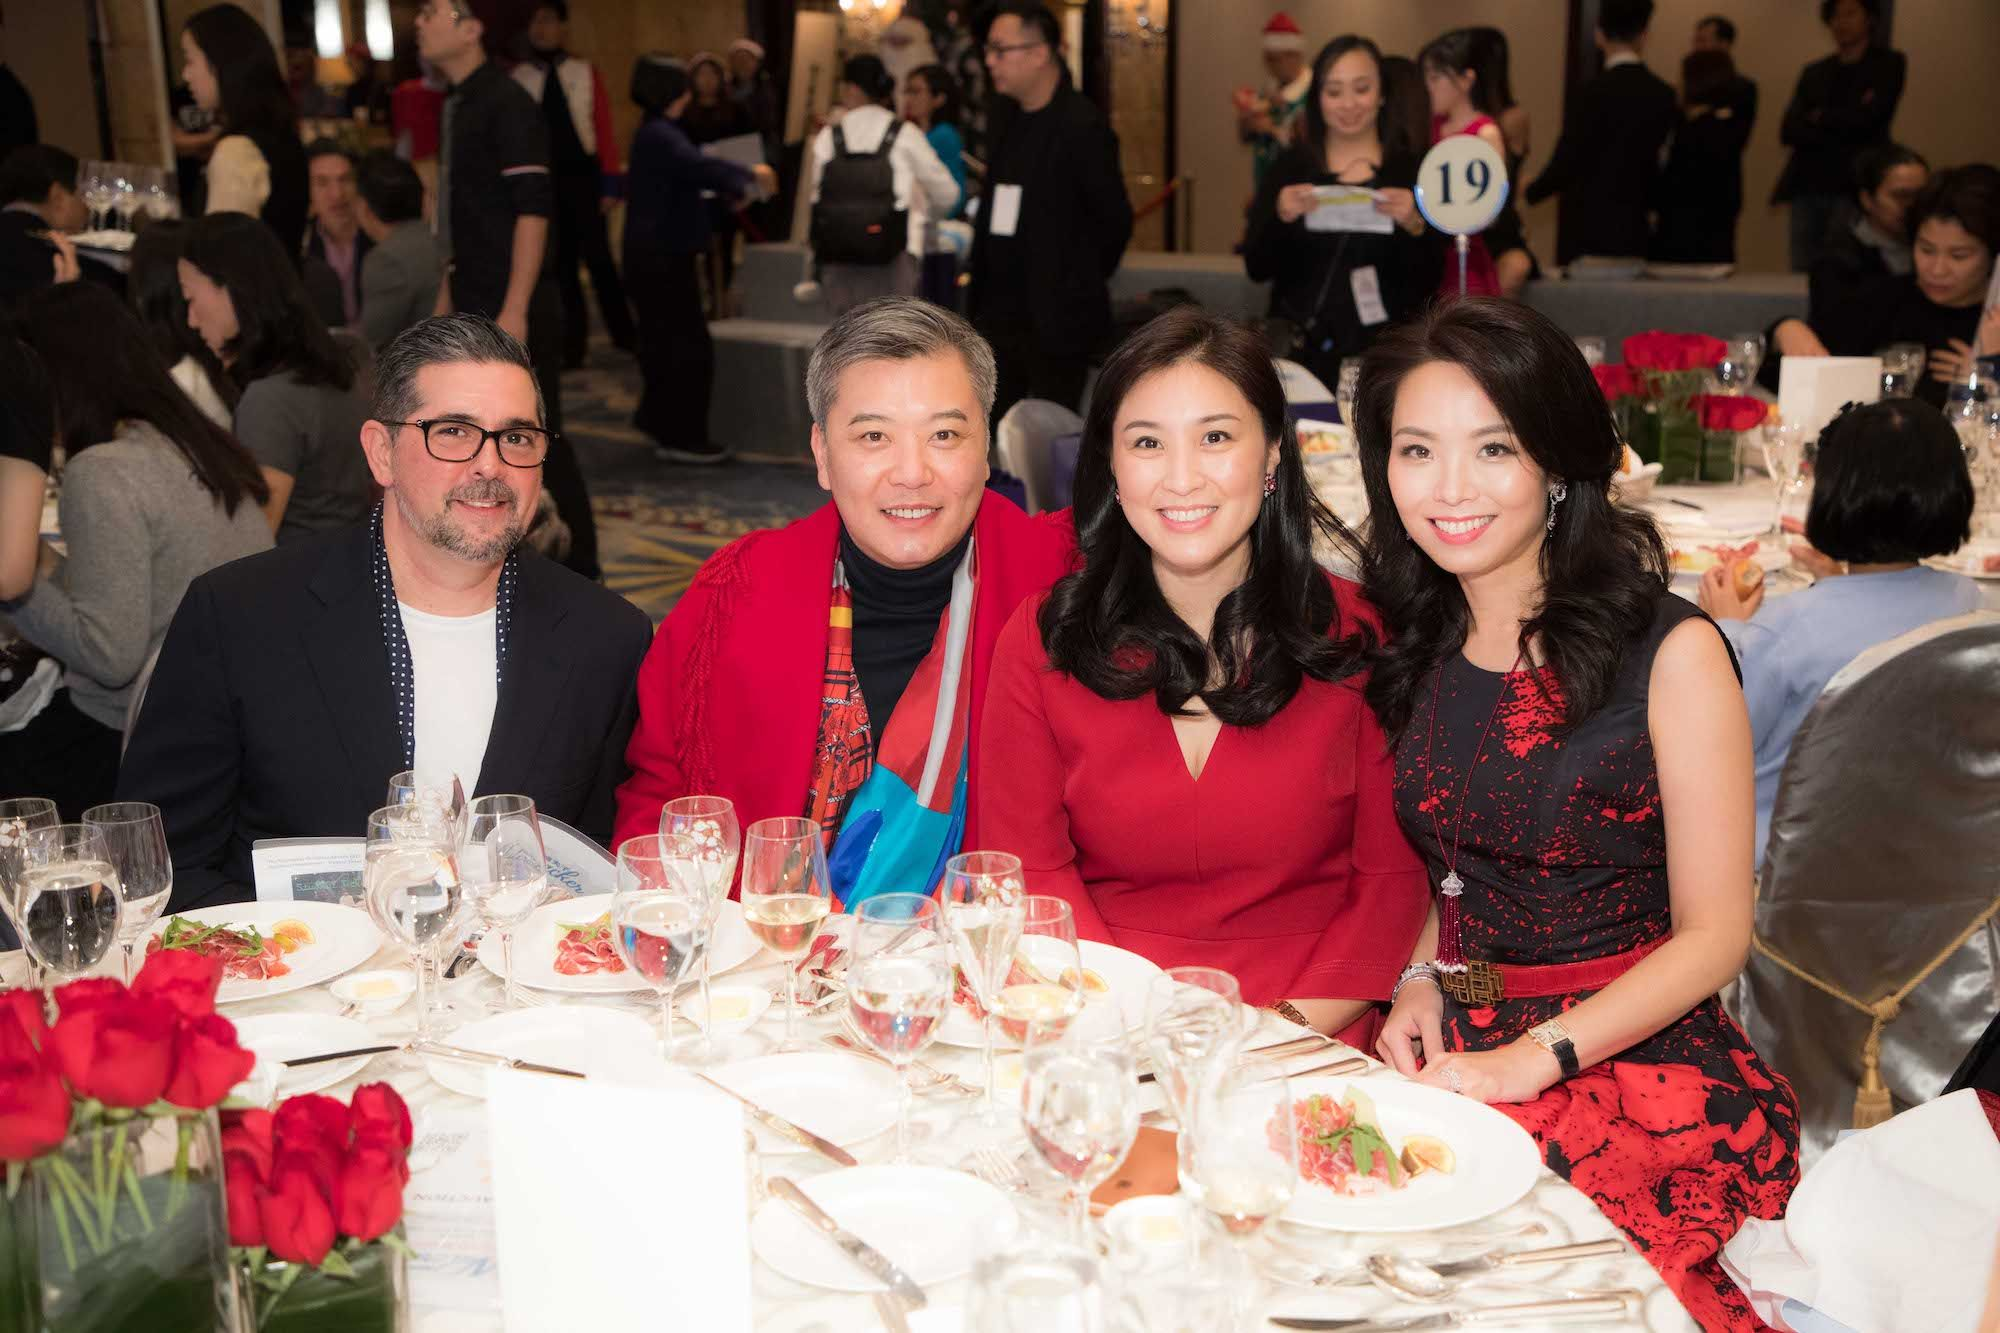 Francisco Anton-Serrano, Peter Cheung, Leigh Tung-Chou, Anne Wang-Liu